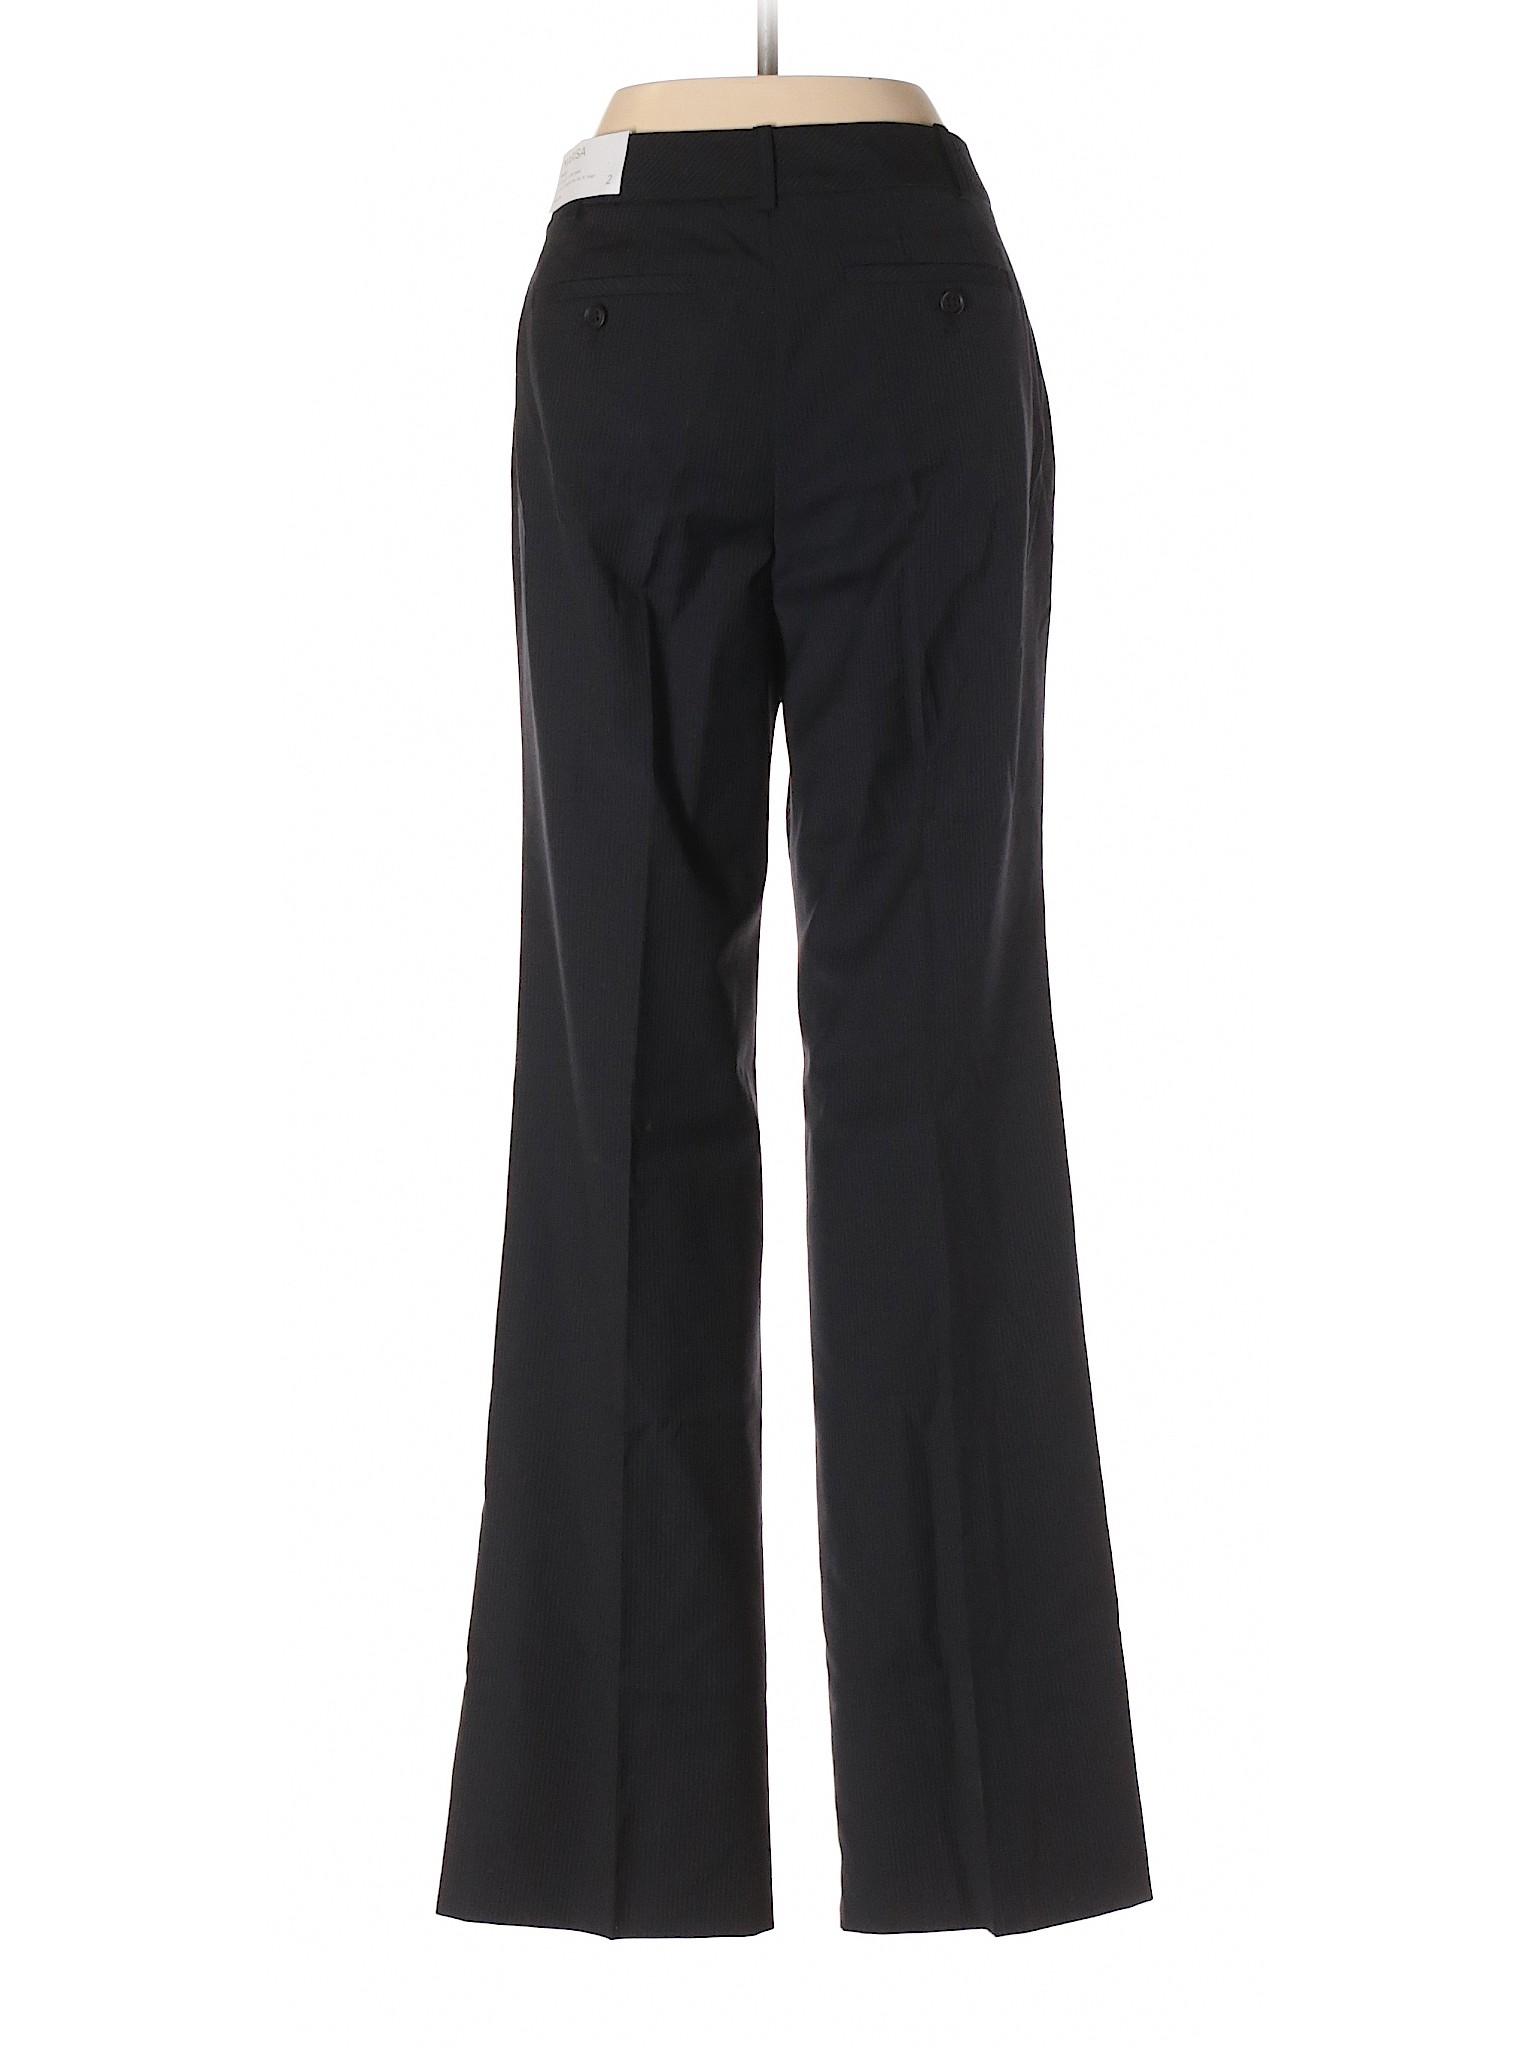 LOFT Boutique Ann Wool winter Pants Taylor 6wPUSR